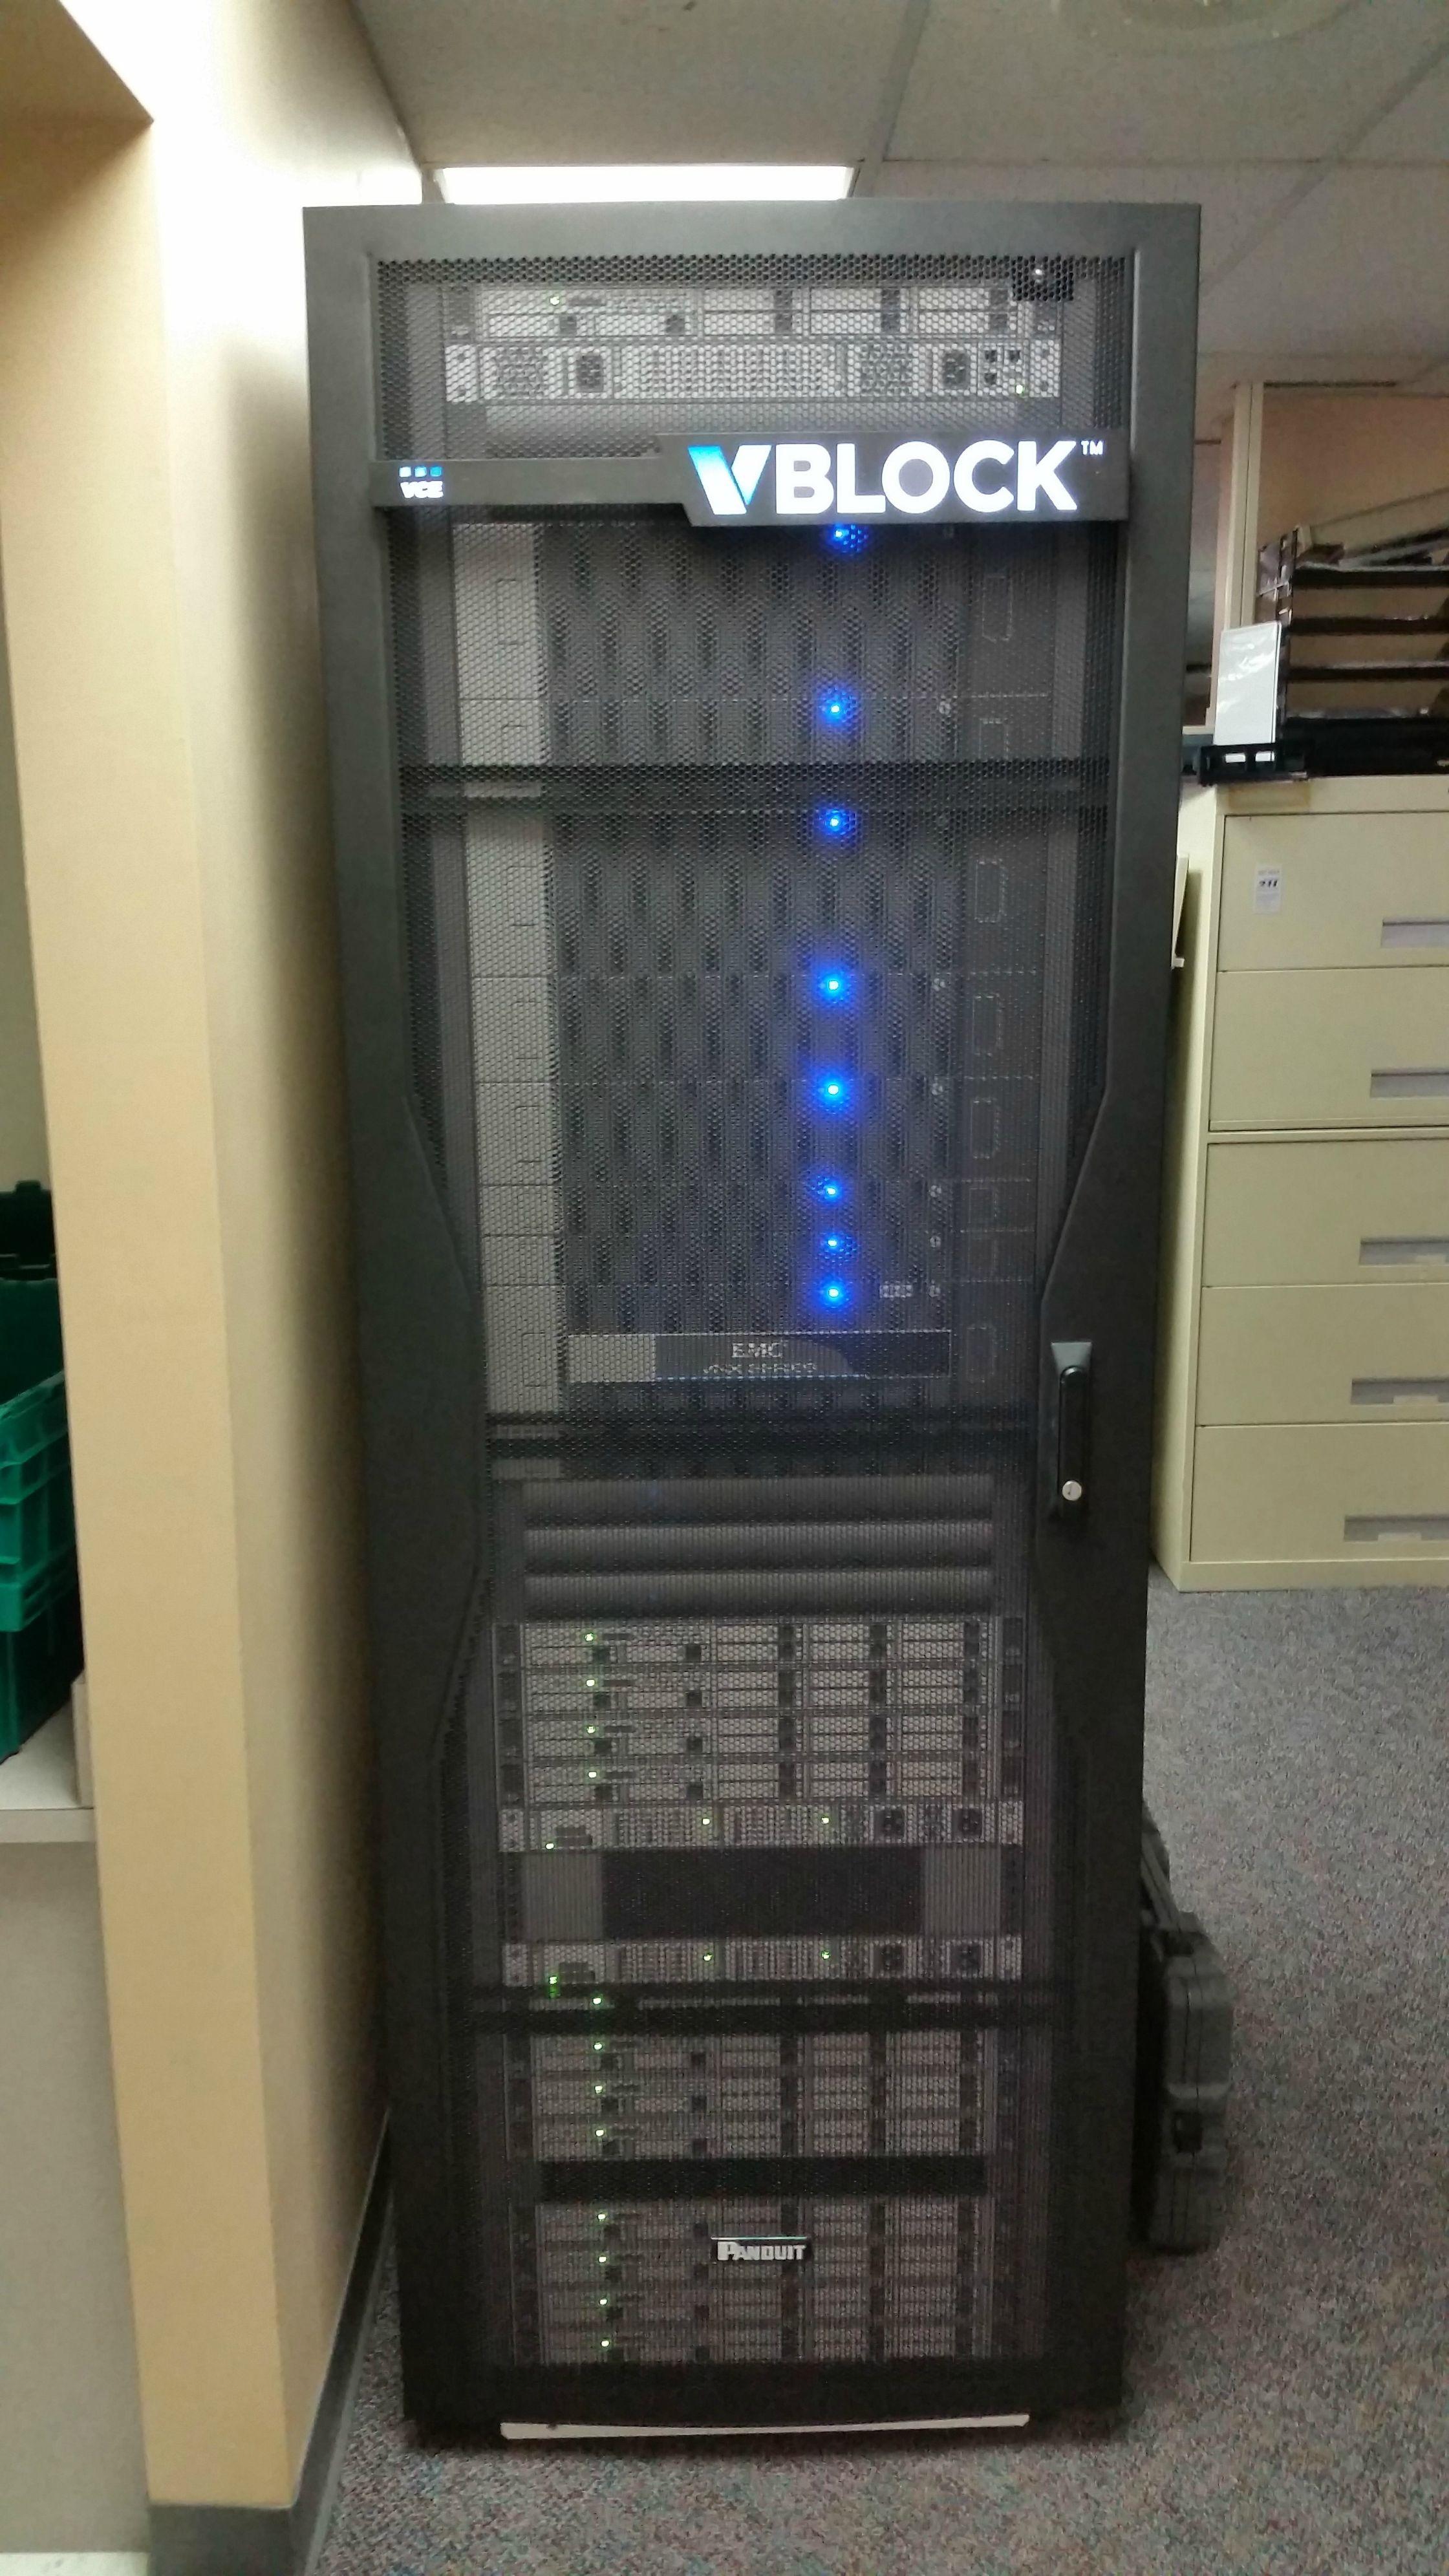 Work's New Server